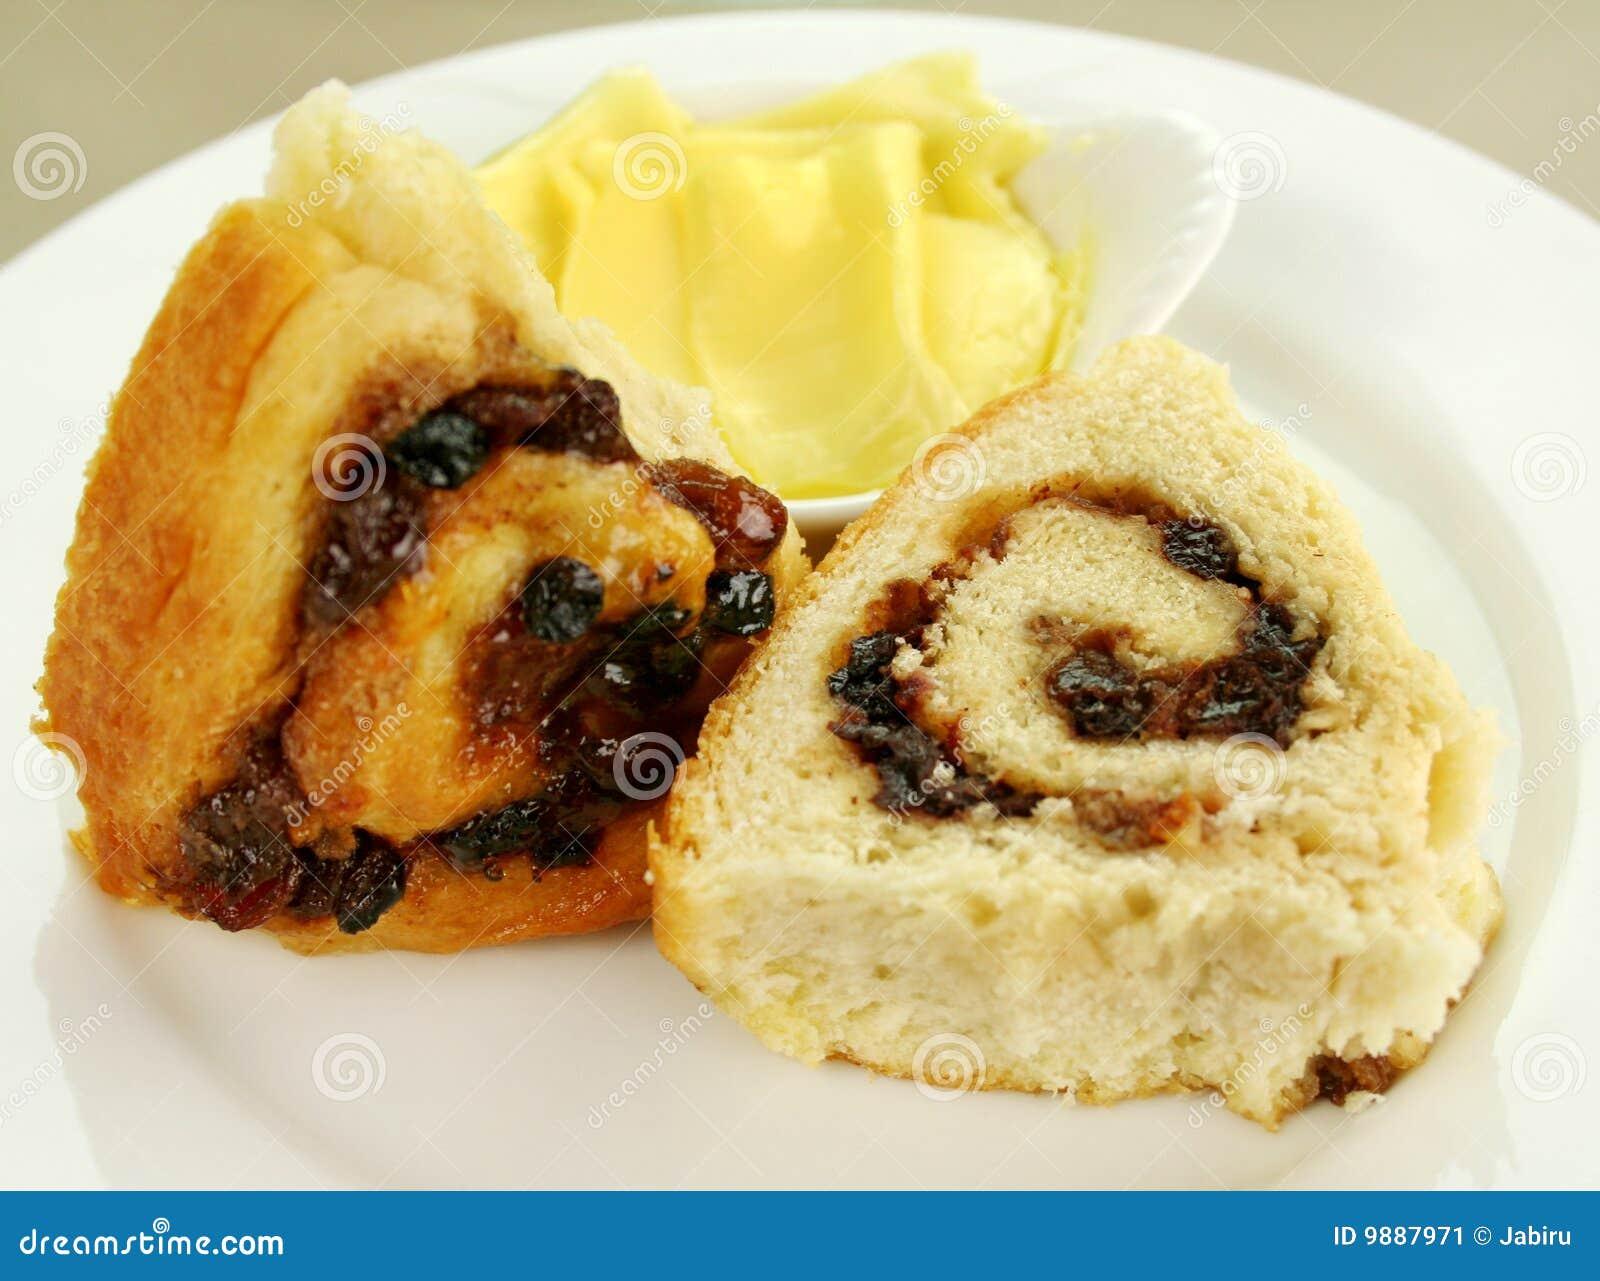 how to make chelsea bun mixture